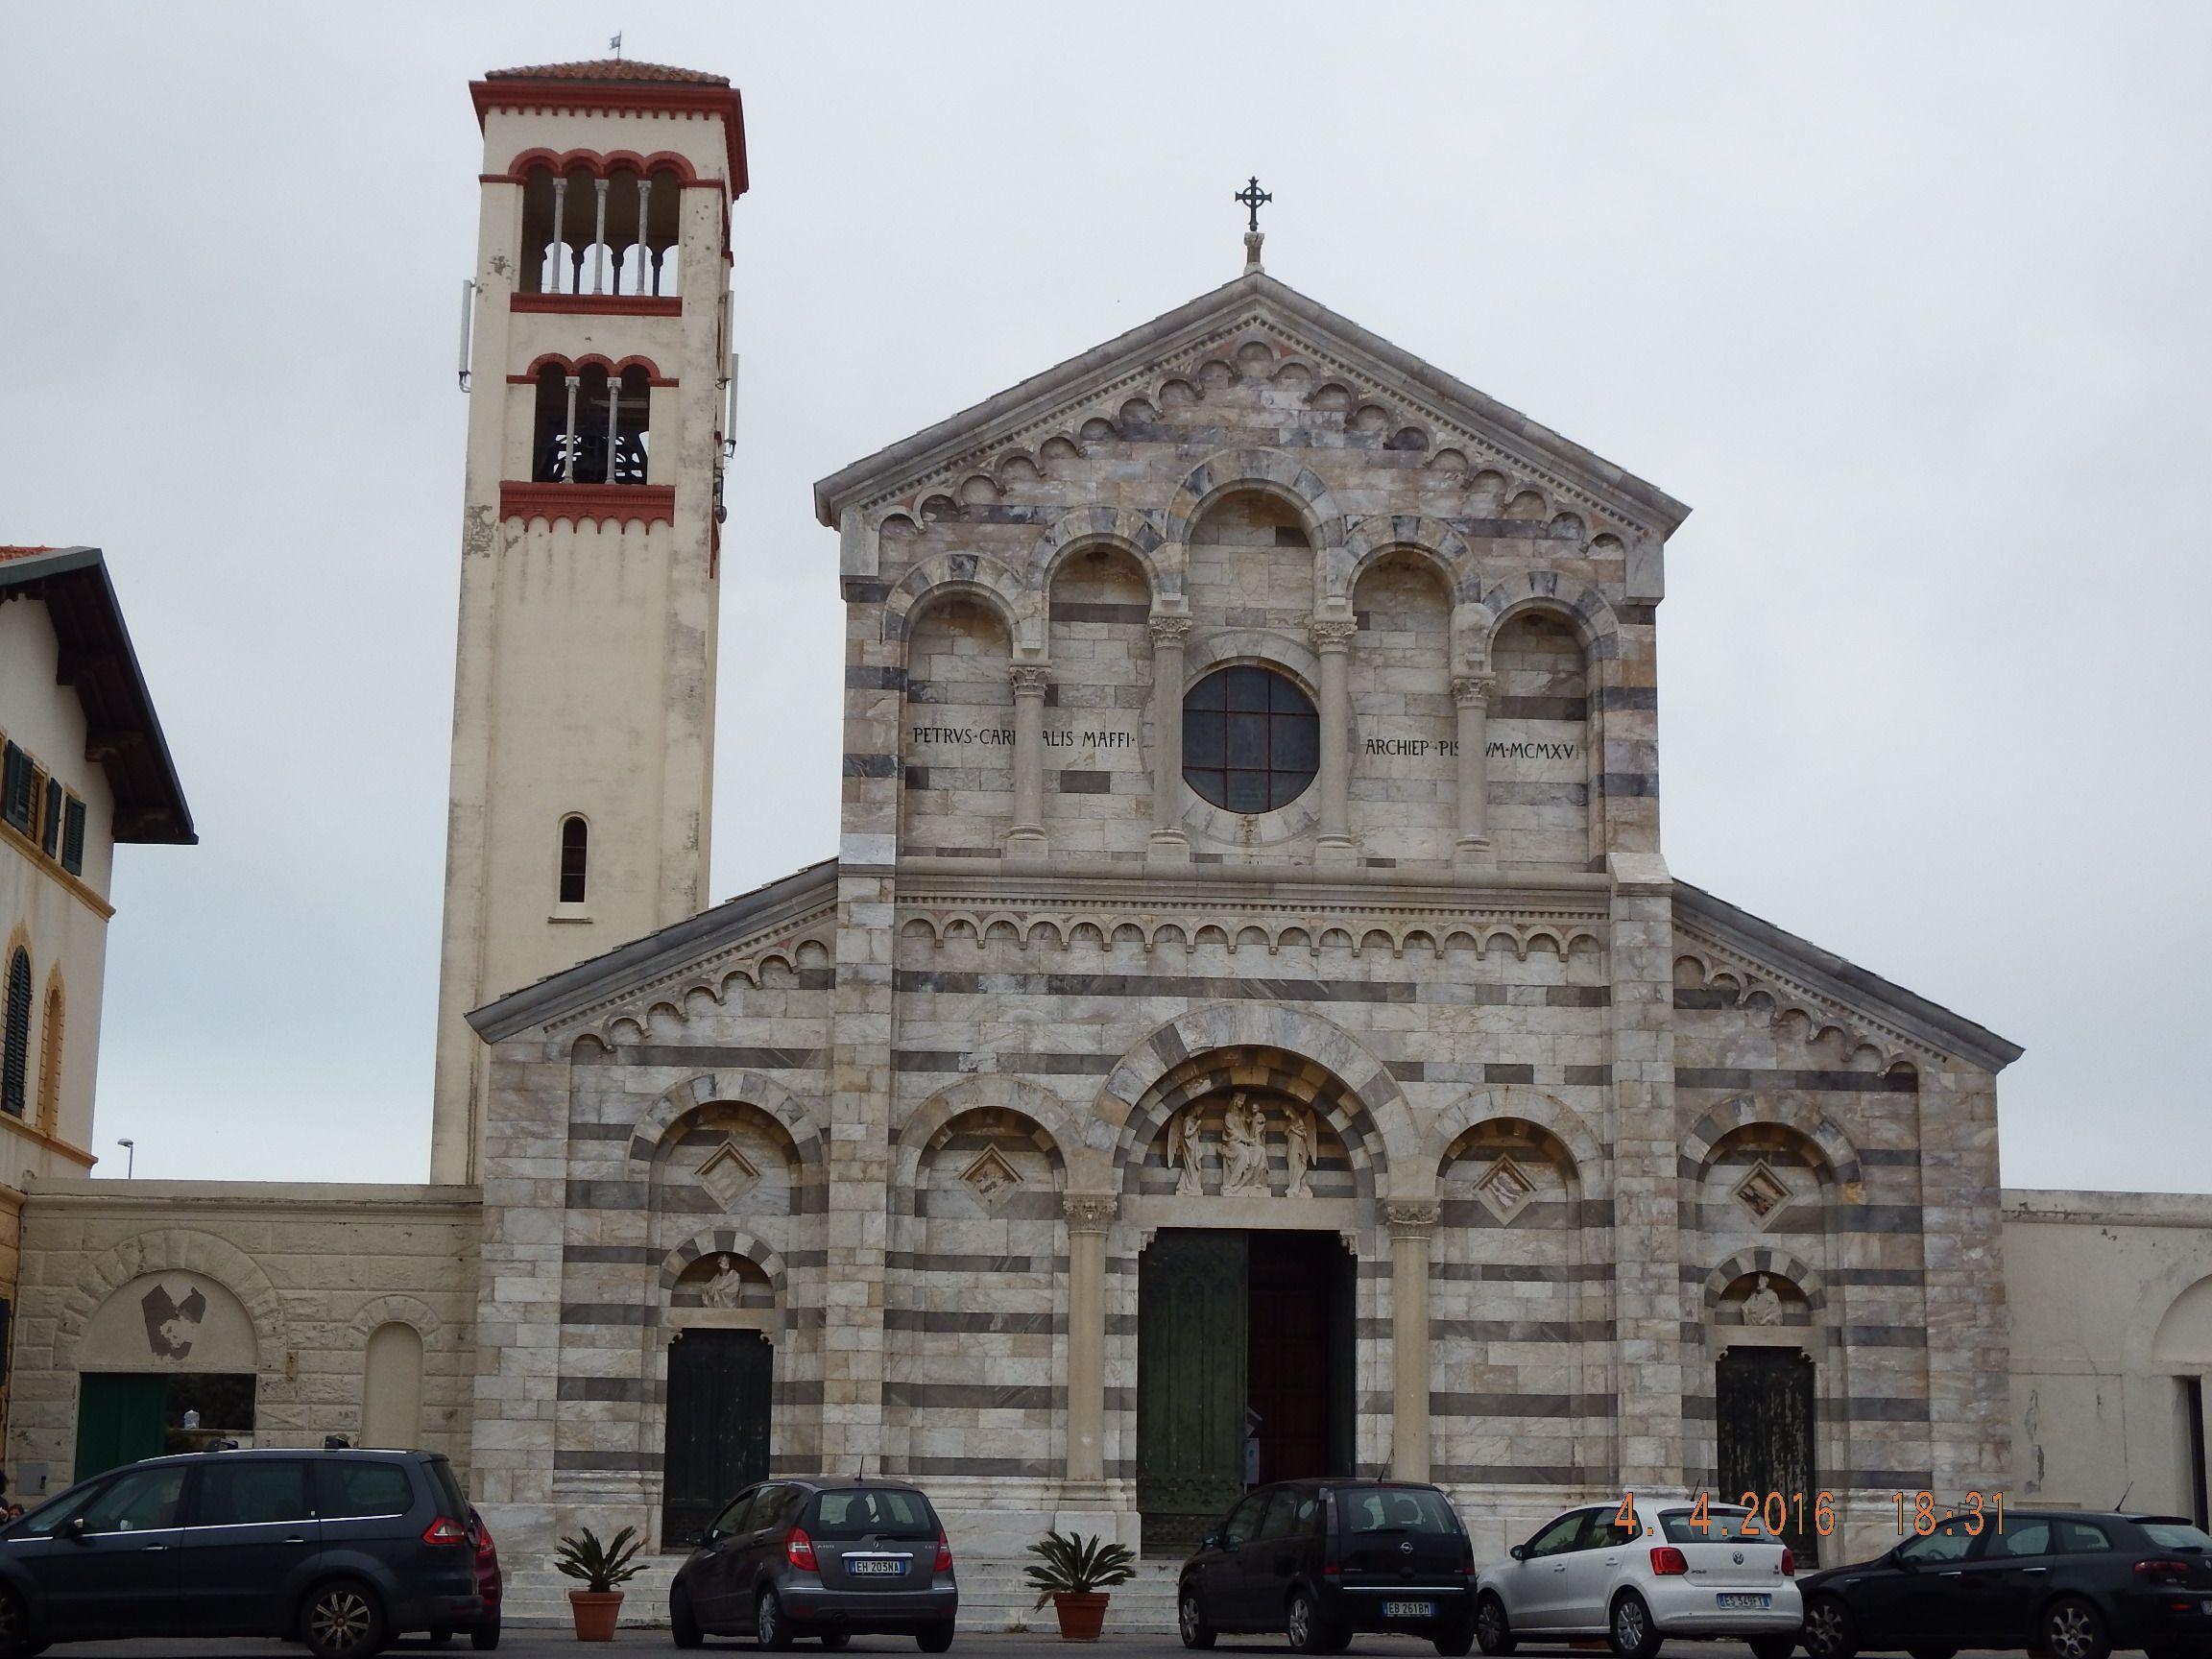 Bagno Balena Marina Di Pisa : Chiesa di marina di pisa italia pinterest pisa e marina